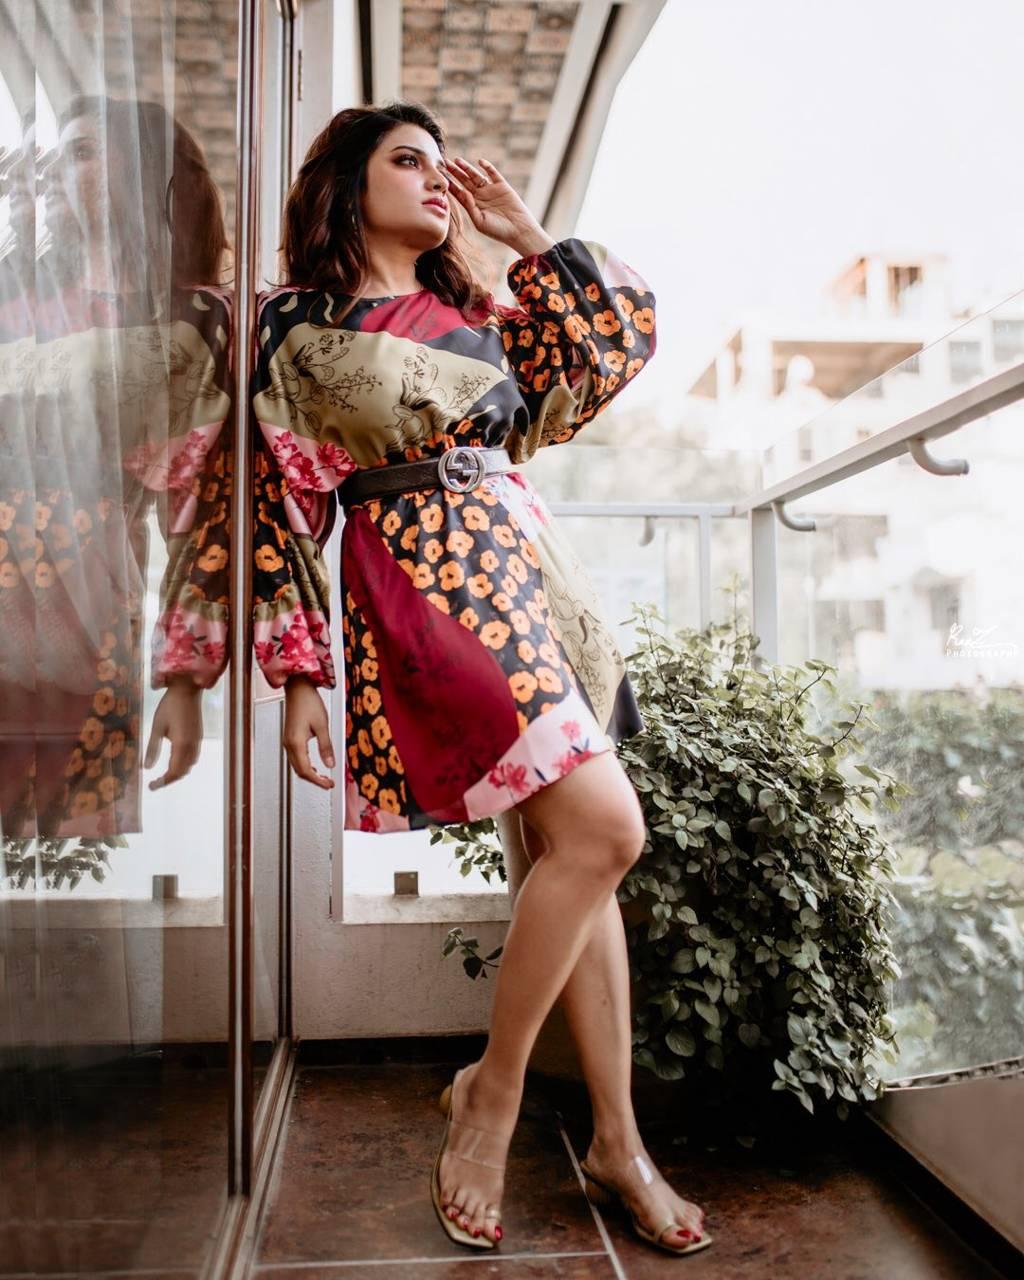 Aathmika  Biography, Age, Life Story, Movies, Photos | World Super Star Bio